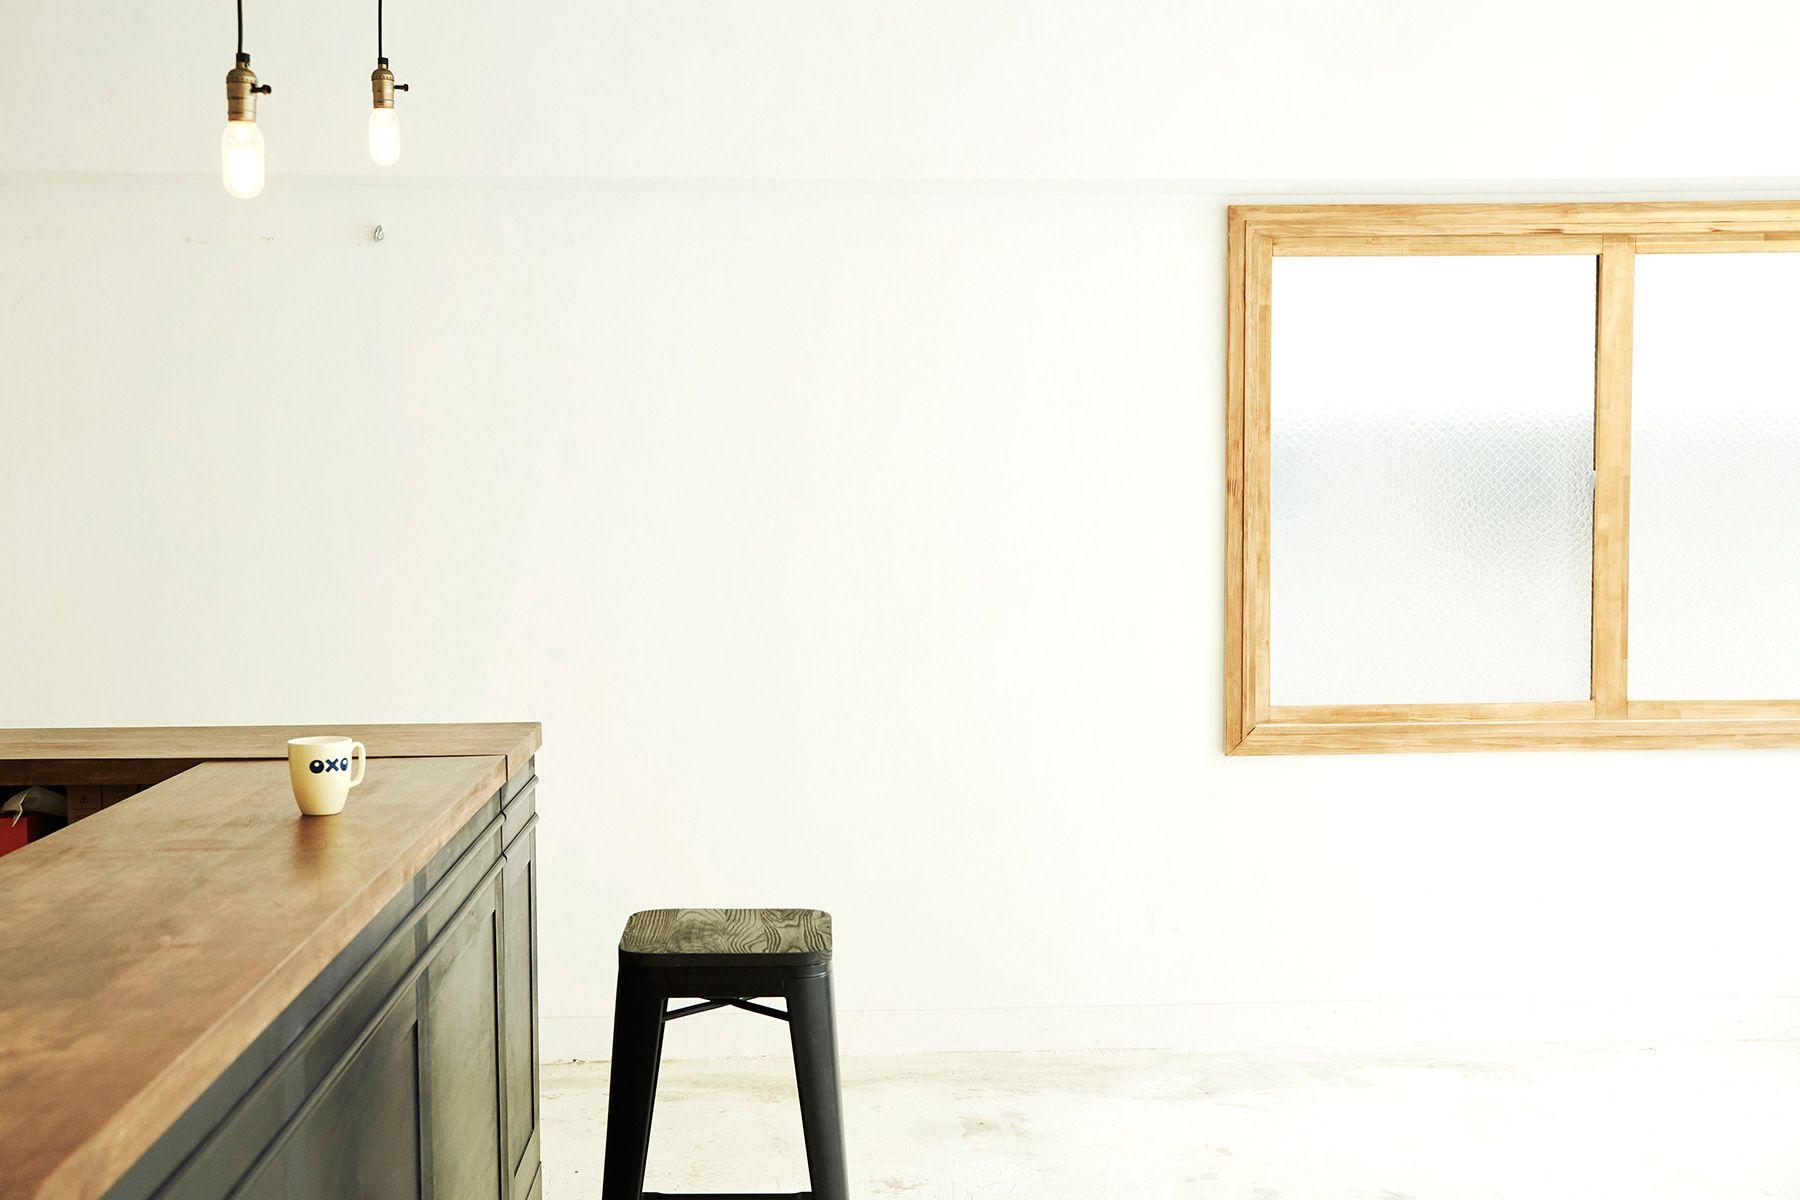 Studio & Rental Space  or (スタジオ オアー)